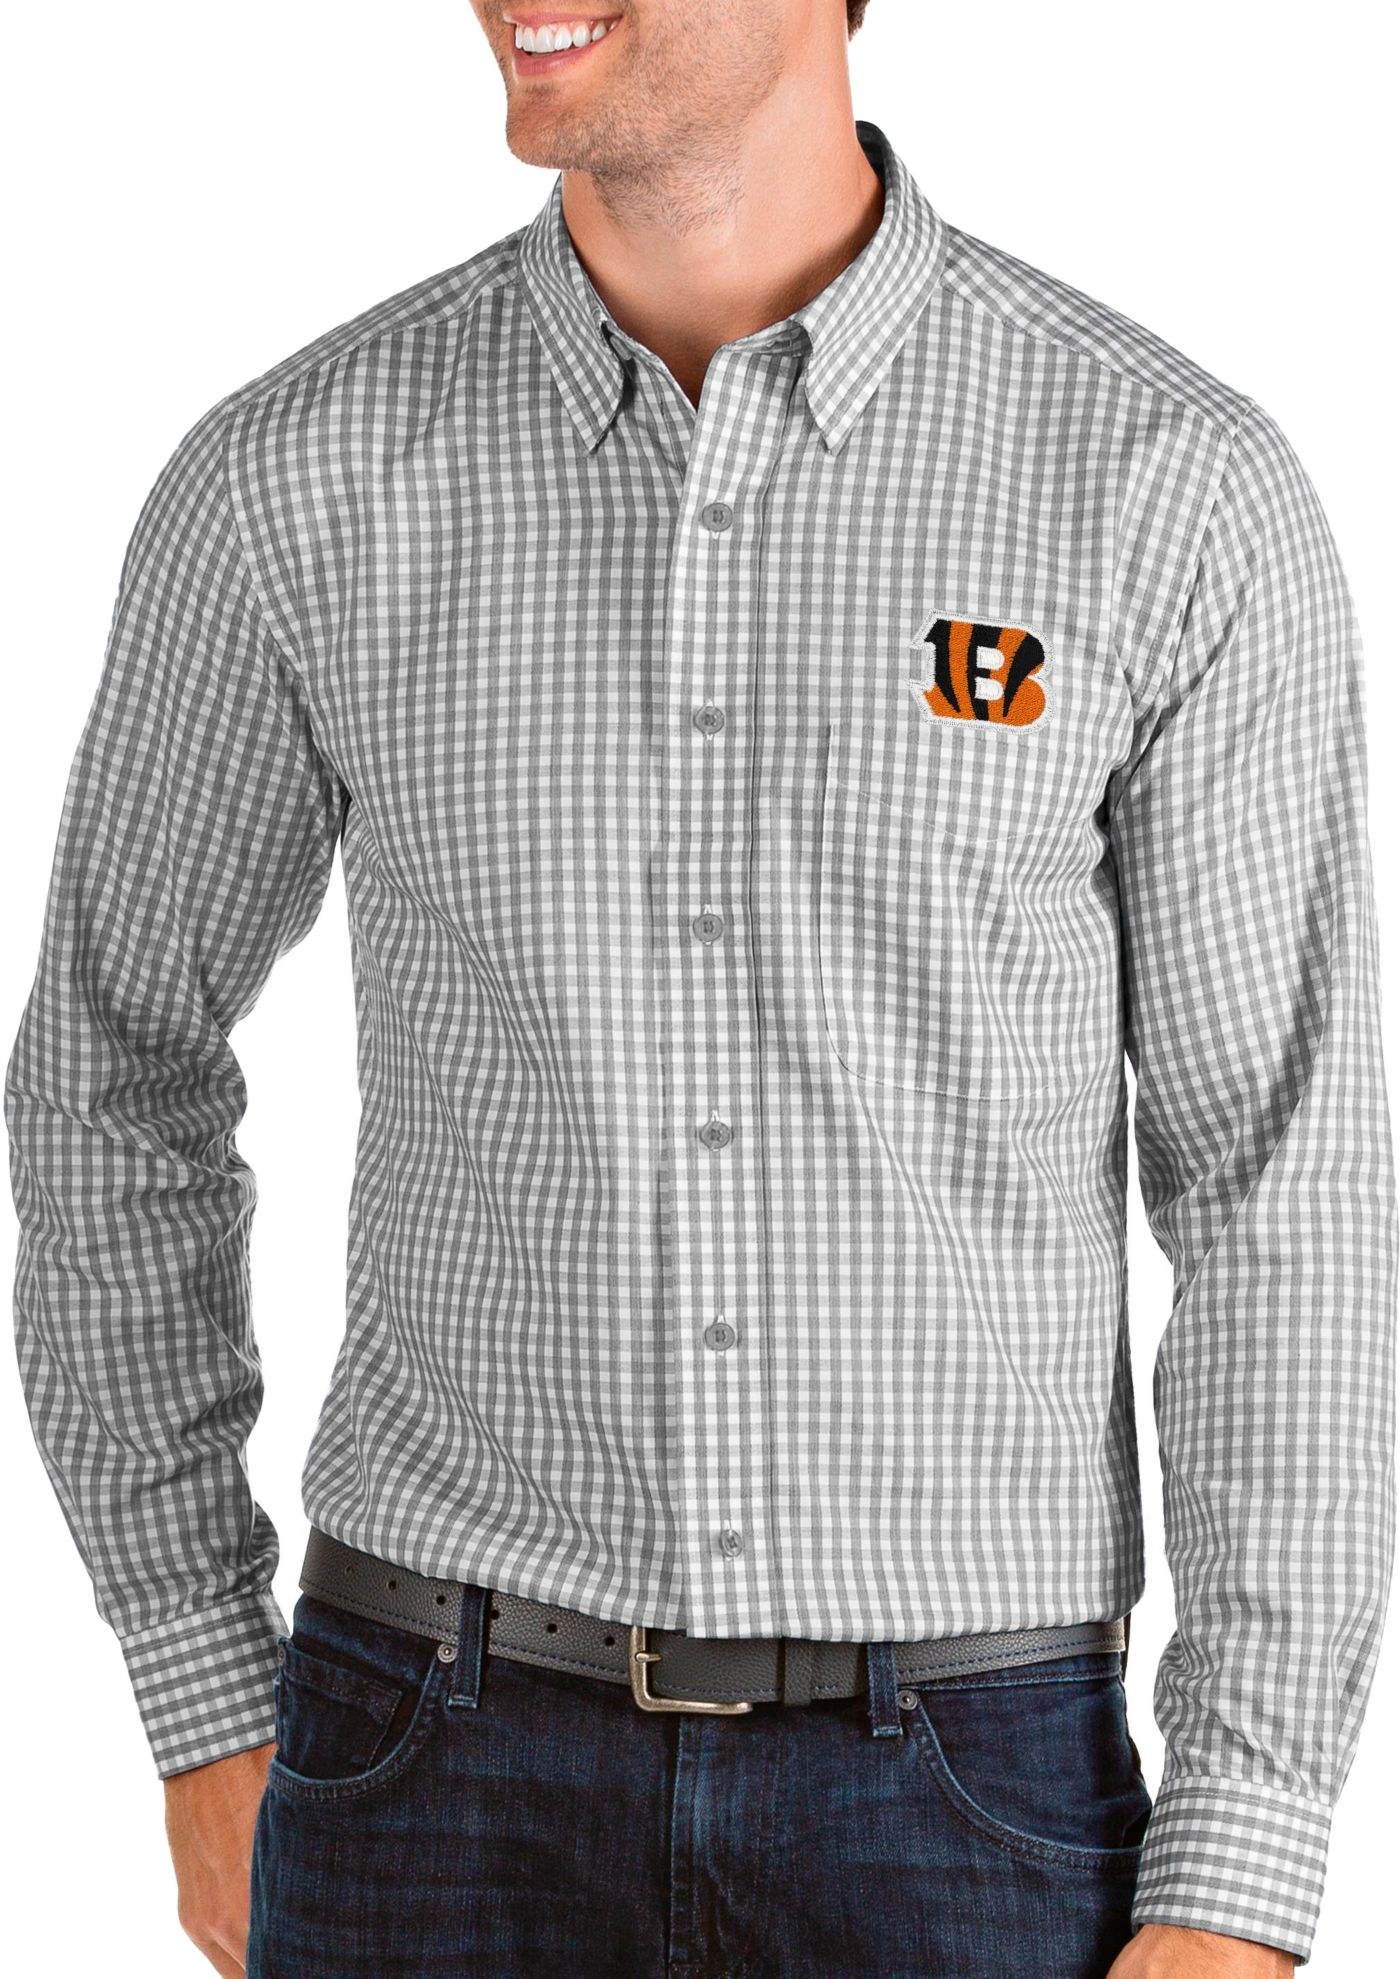 Antigua Men's Cincinnati Bengals Structure Button Down Grey Dress Shirt